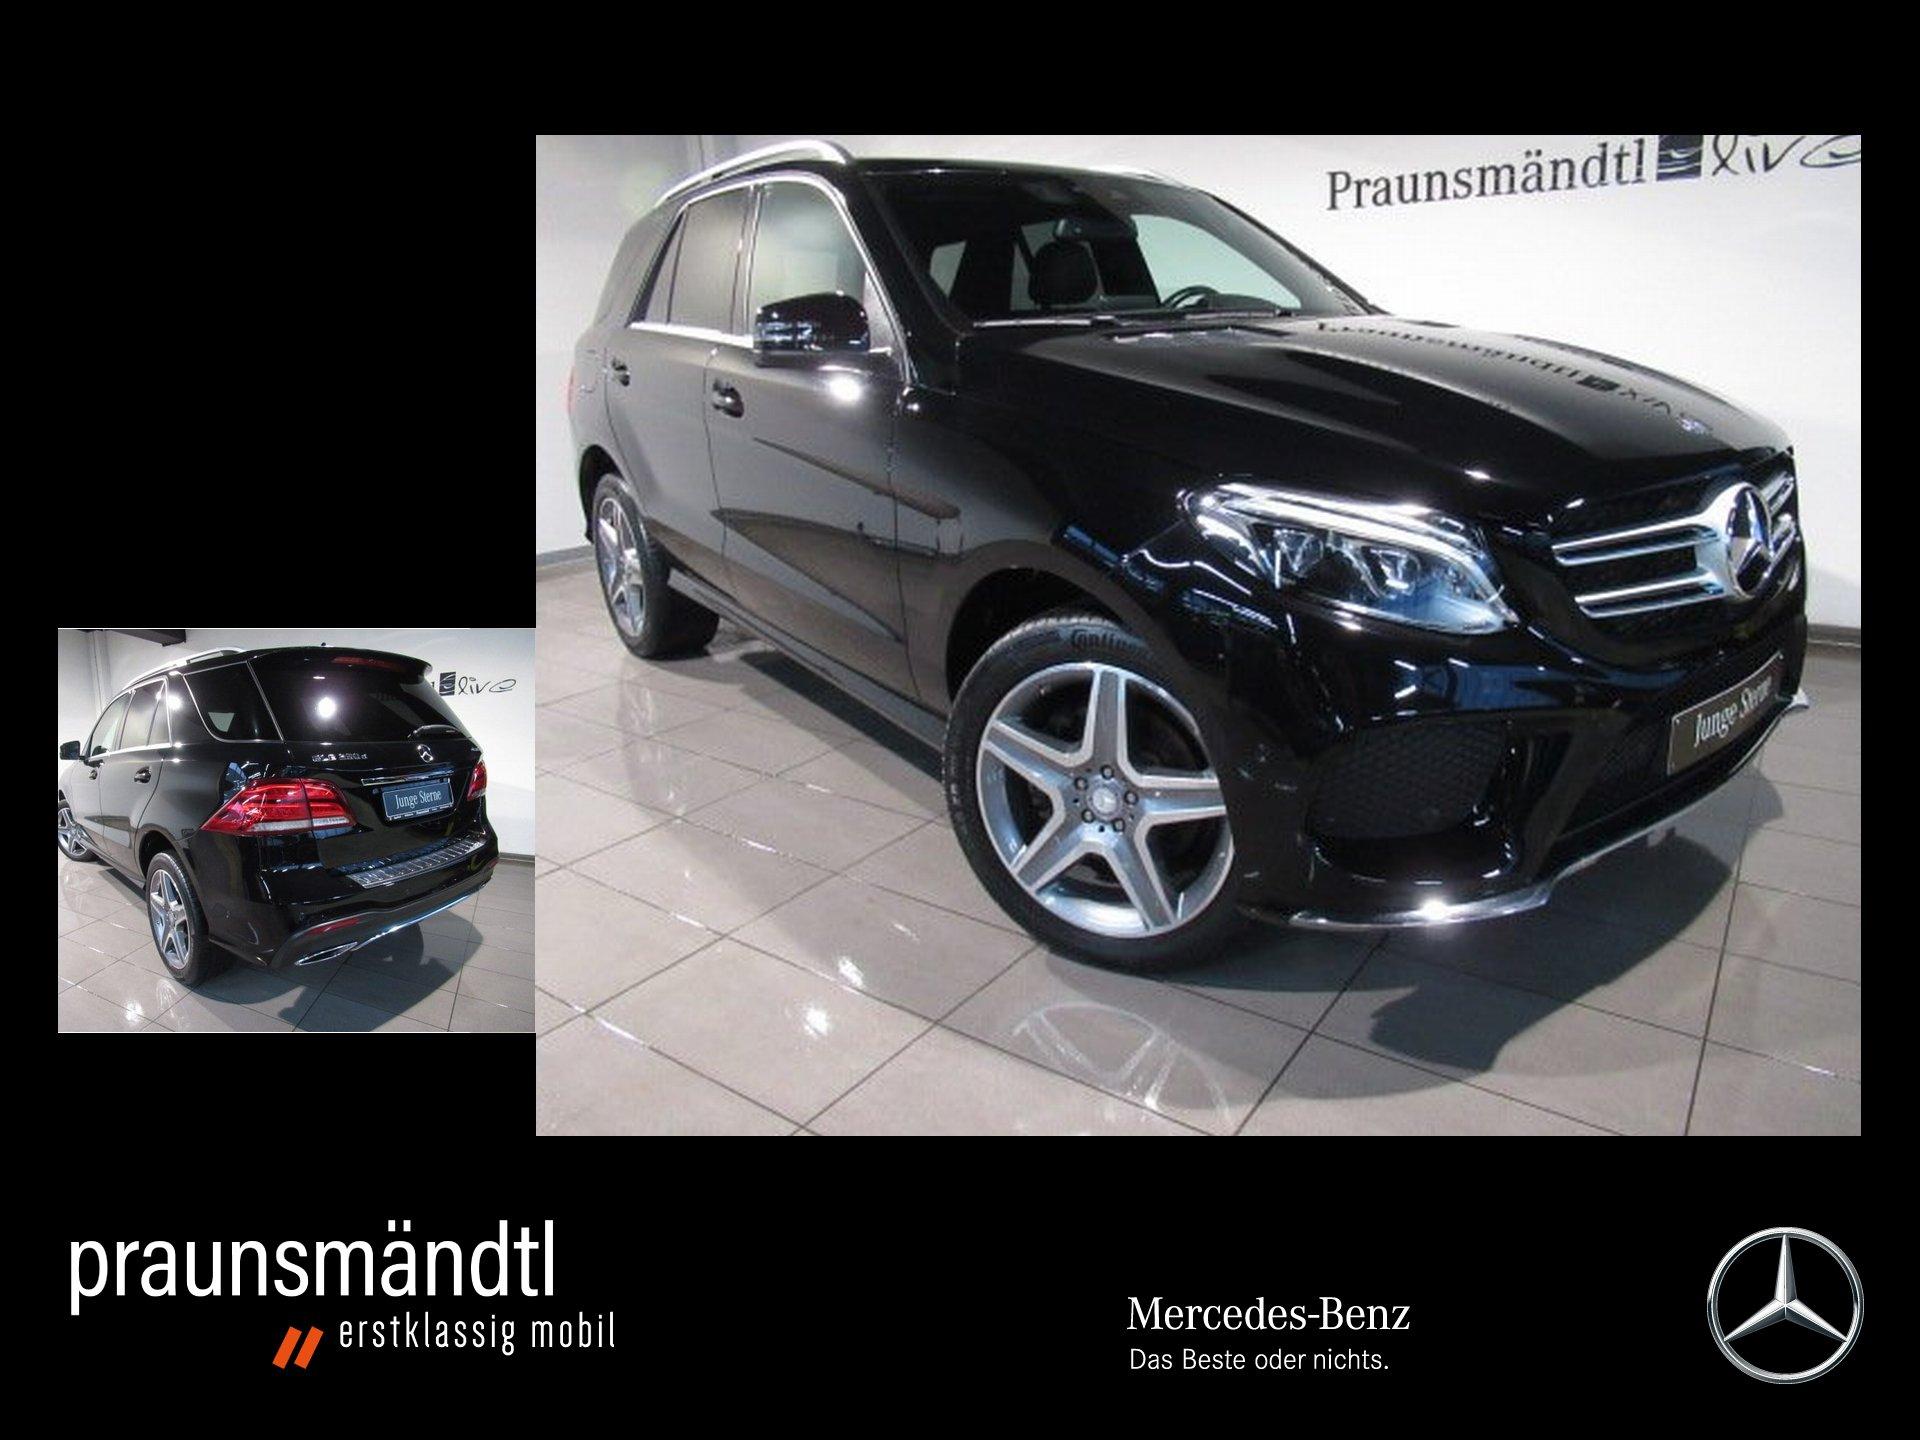 Mercedes-Benz GLE 250 d 4M AMG LED/AHK/Comand/Kamera/AMG 20, Jahr 2016, Diesel